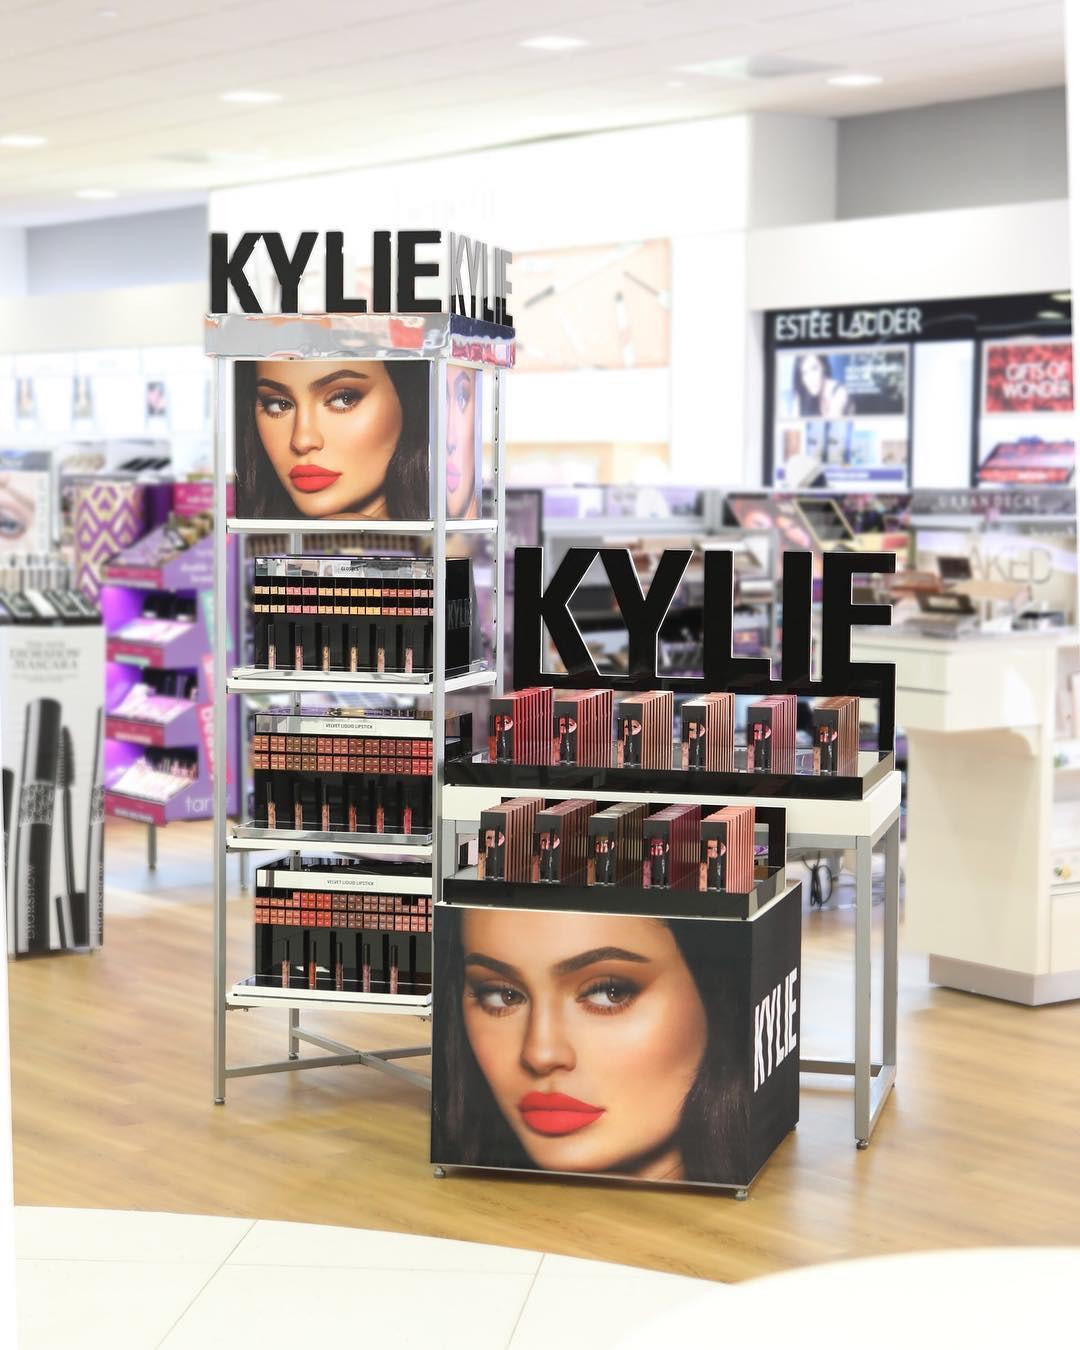 A Kylie Cosmetics display inside an Ulta Beauty store | Source: Instagram/@ultabeauty